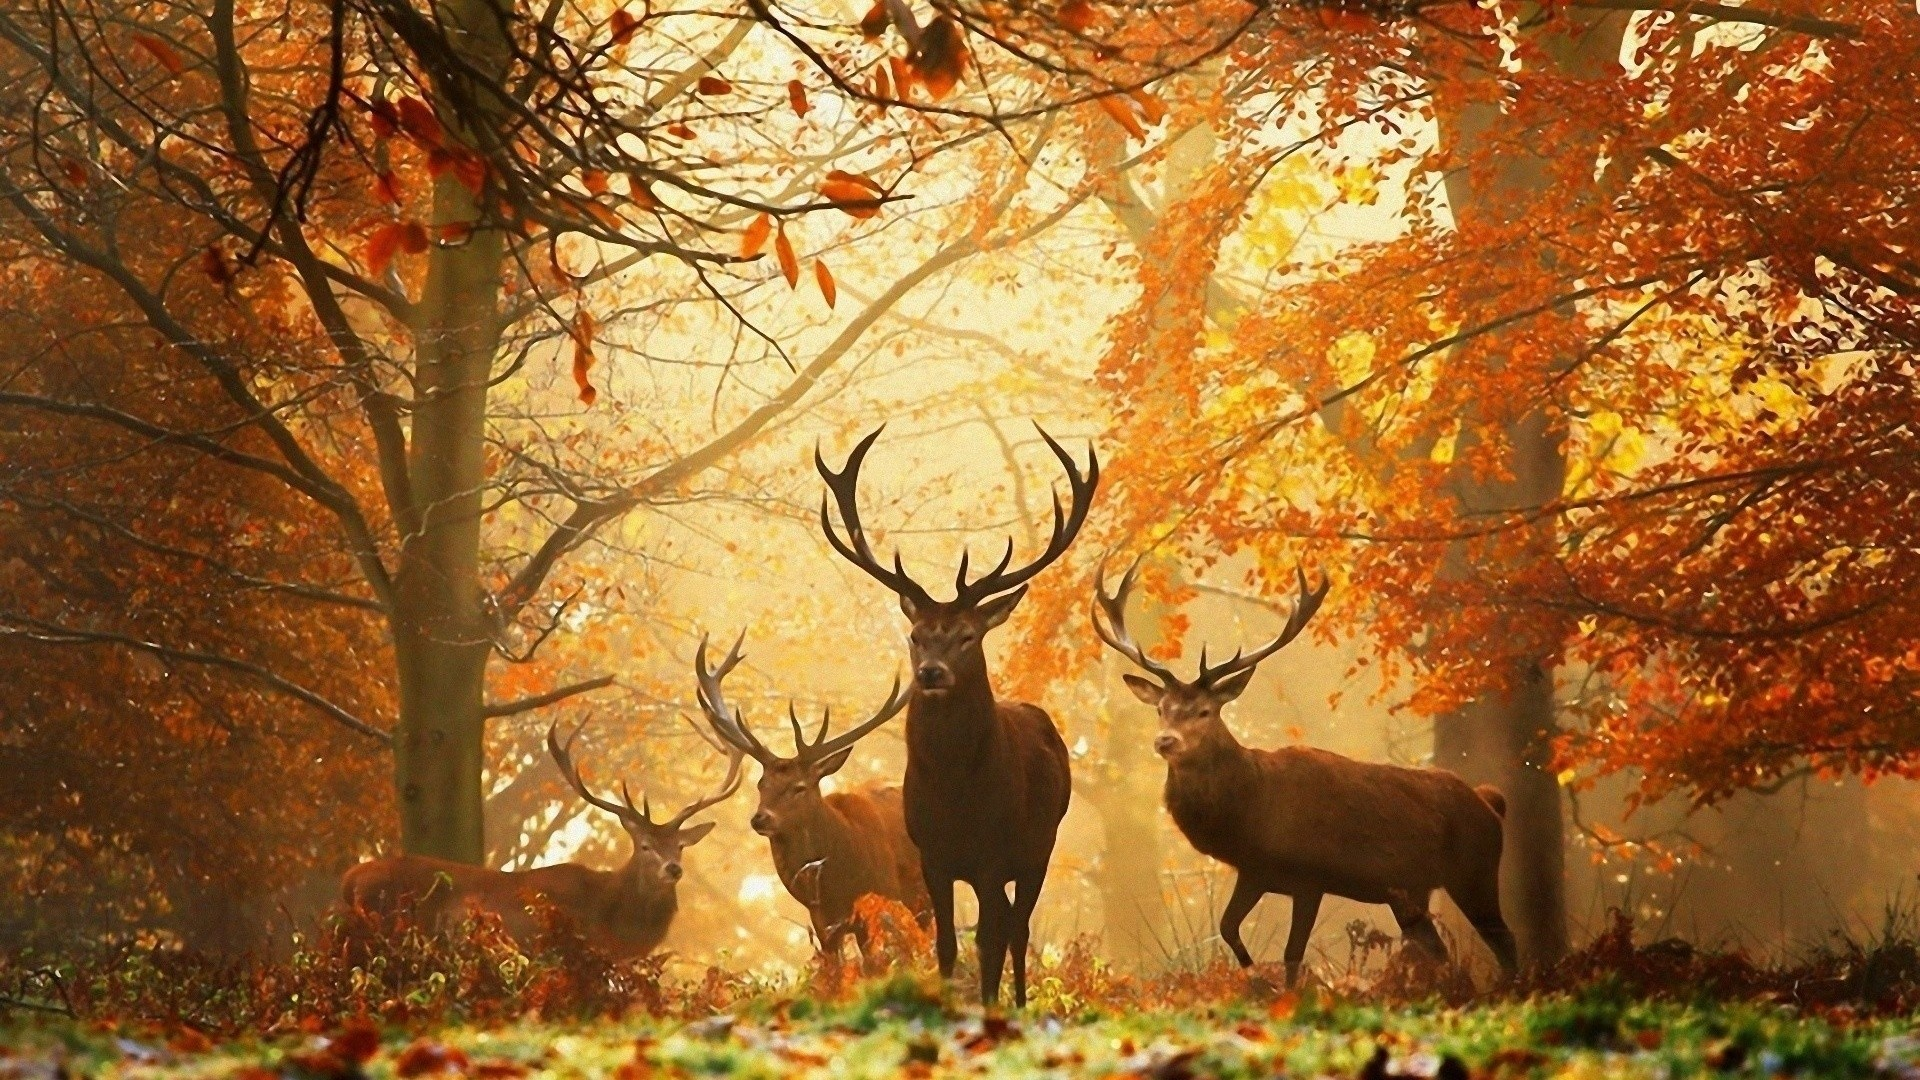 Deer wallpaper photo hd